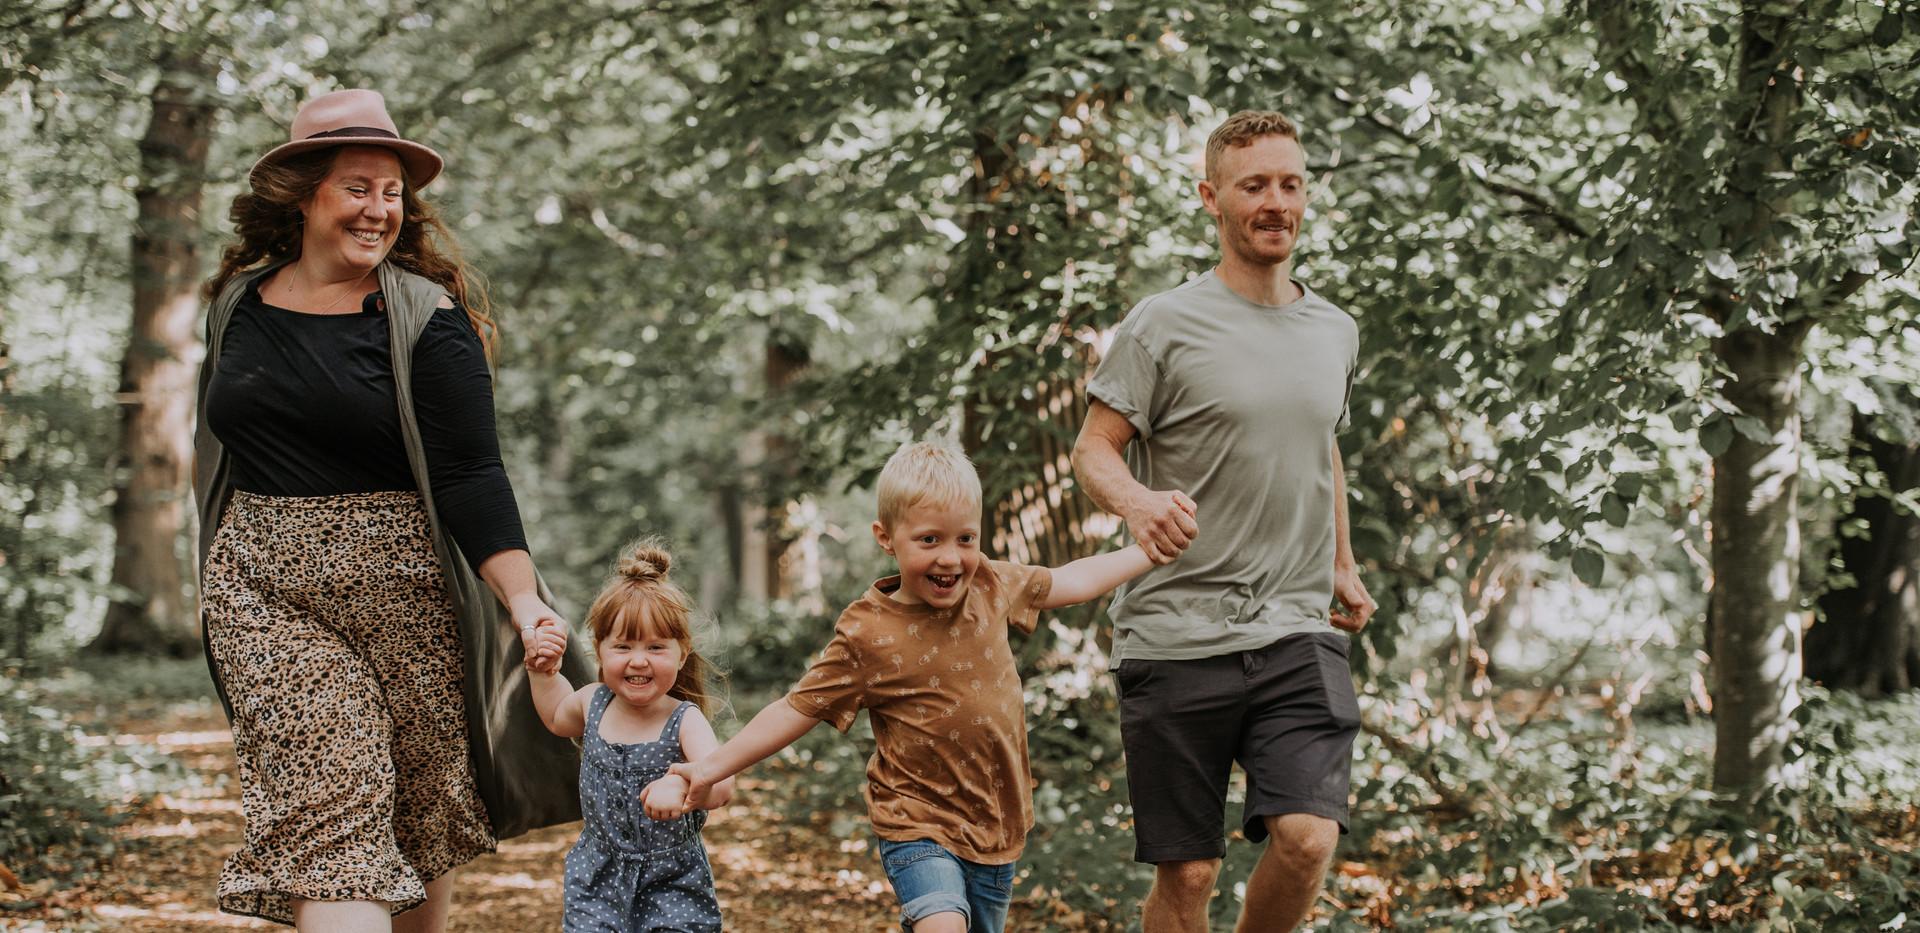 Family running through forest